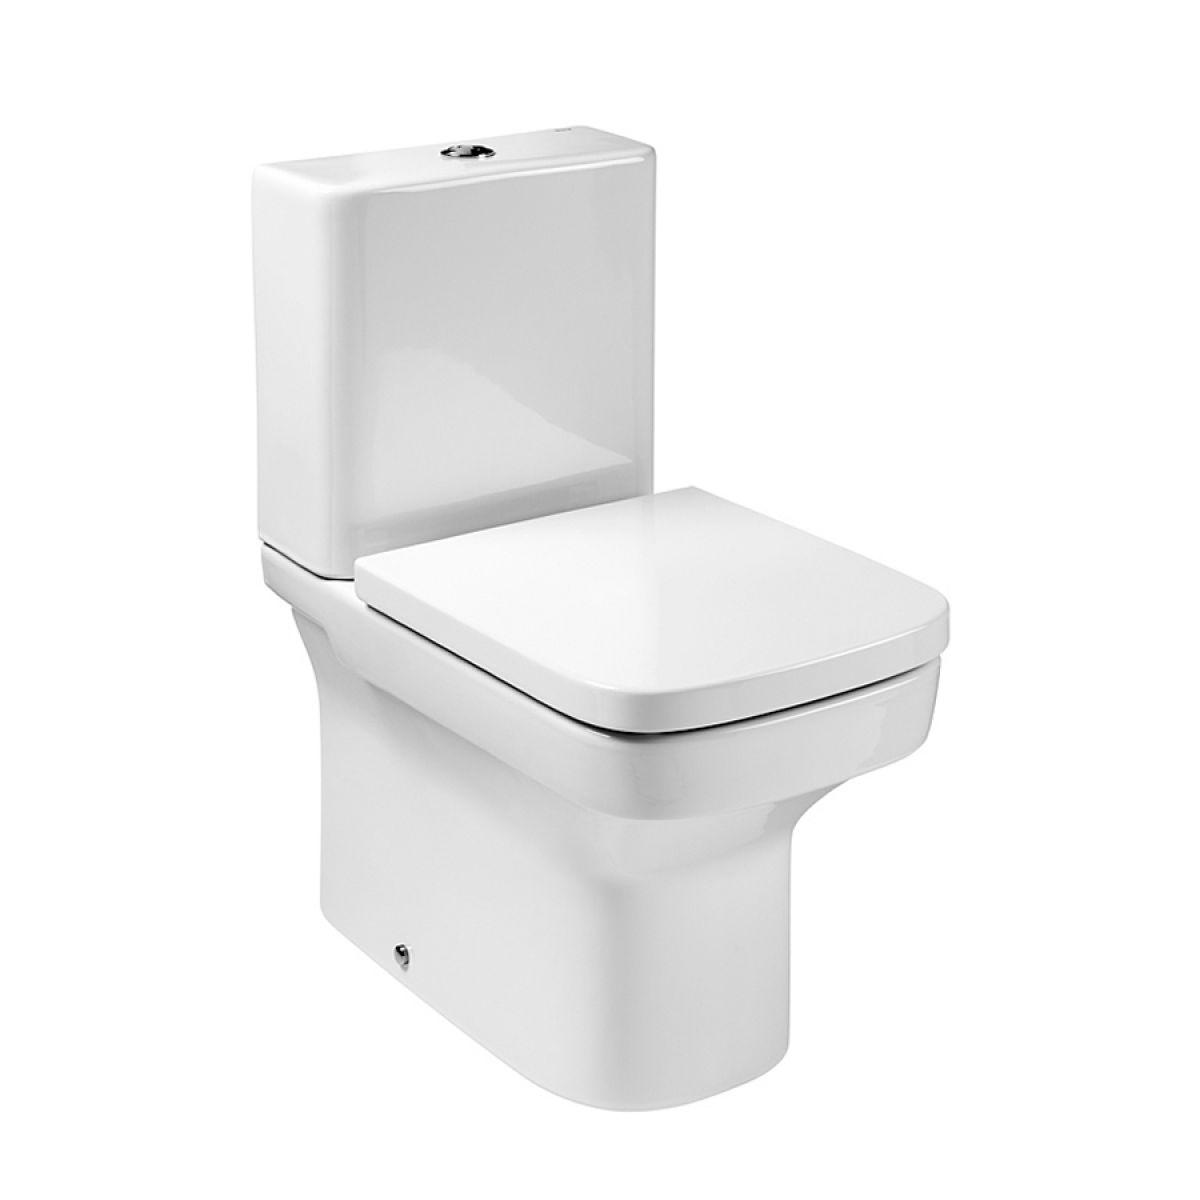 roca dama n compact close coupled toilet closed back. Black Bedroom Furniture Sets. Home Design Ideas